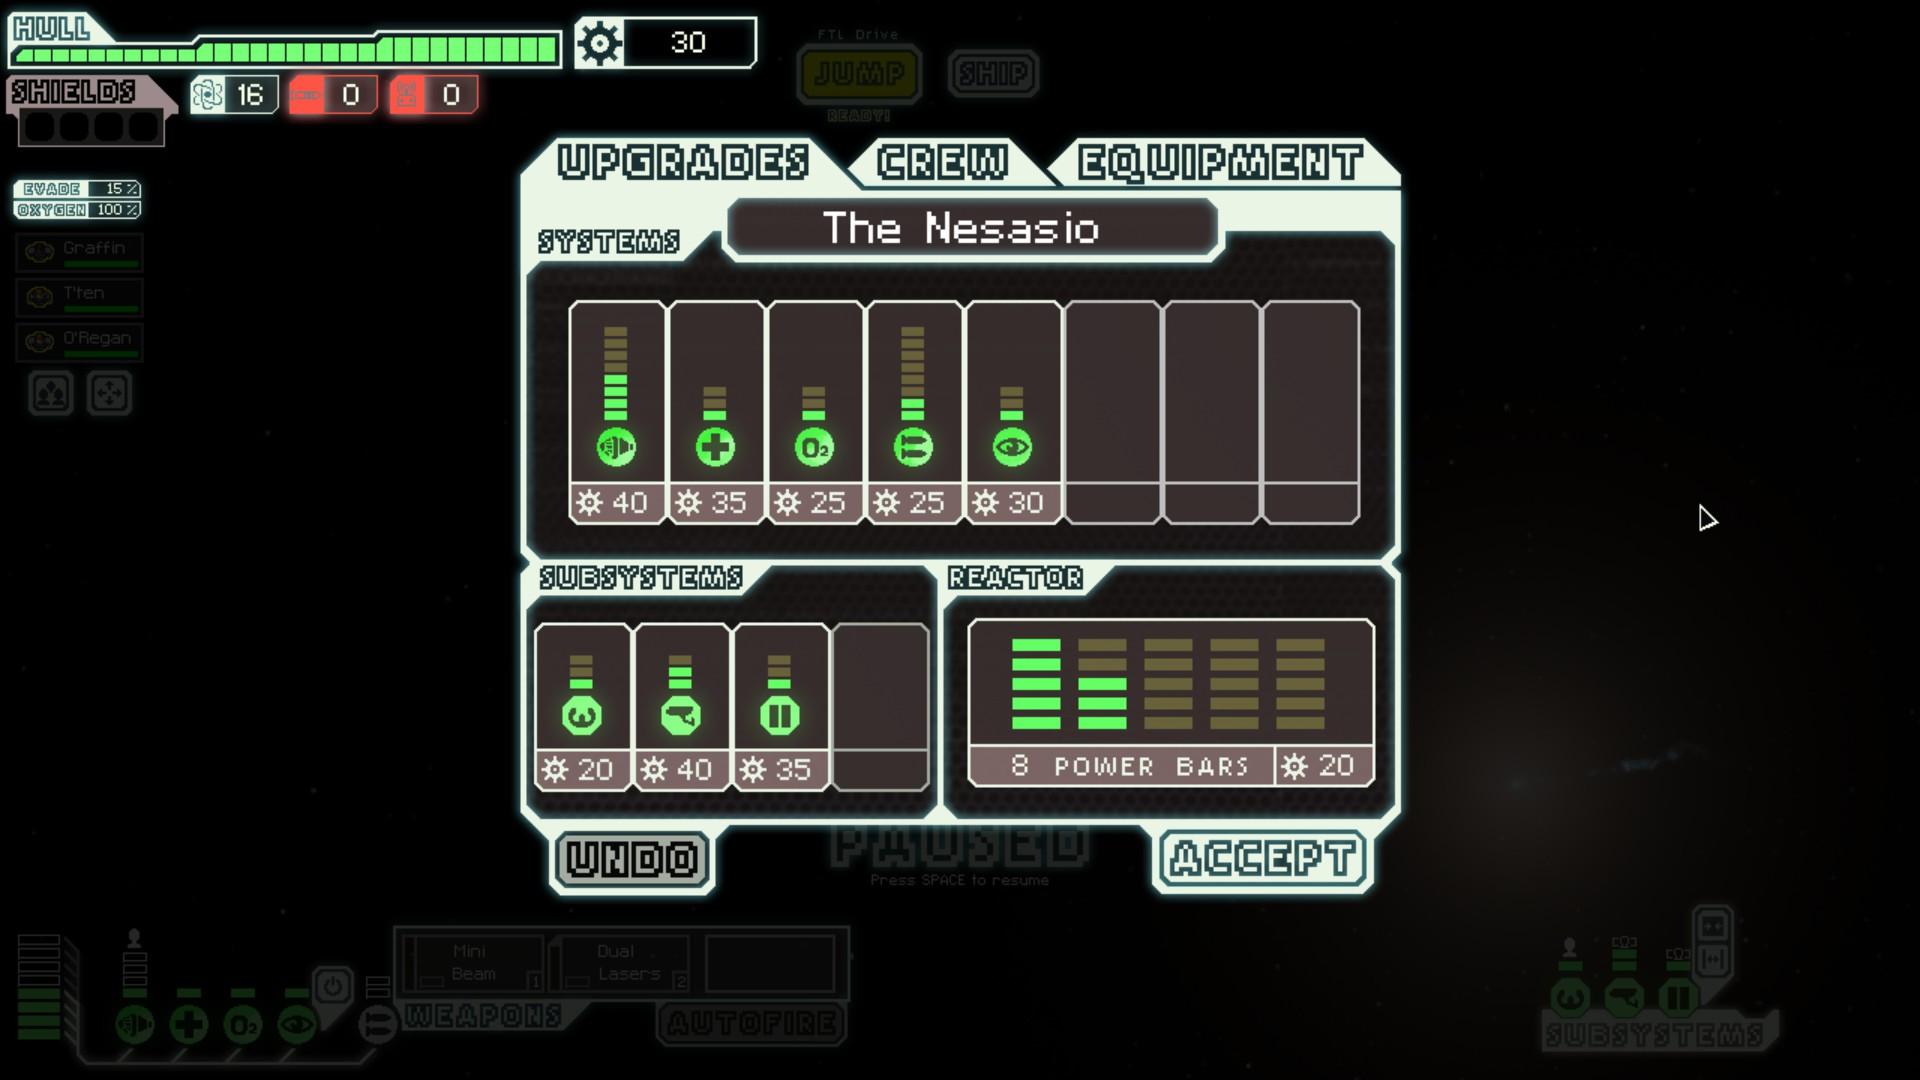 FTL - Equipement vaisseau